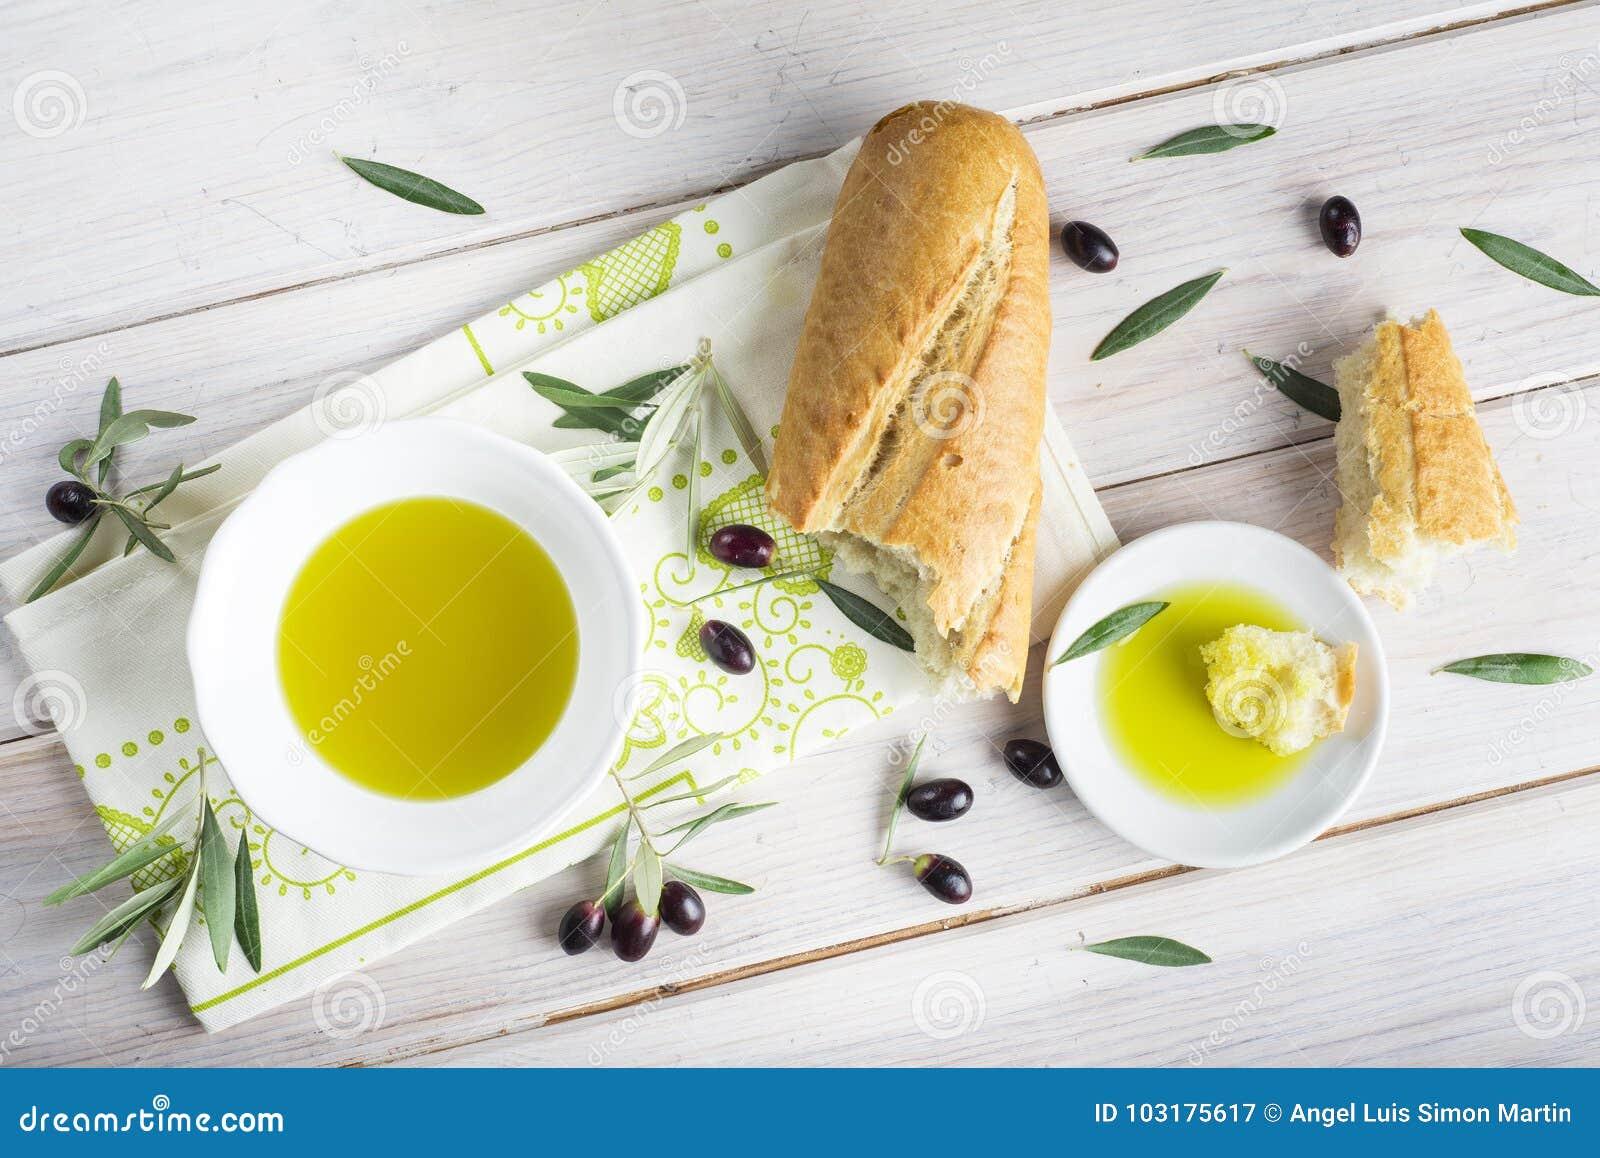 Reines Extraolivenöl mit Brot